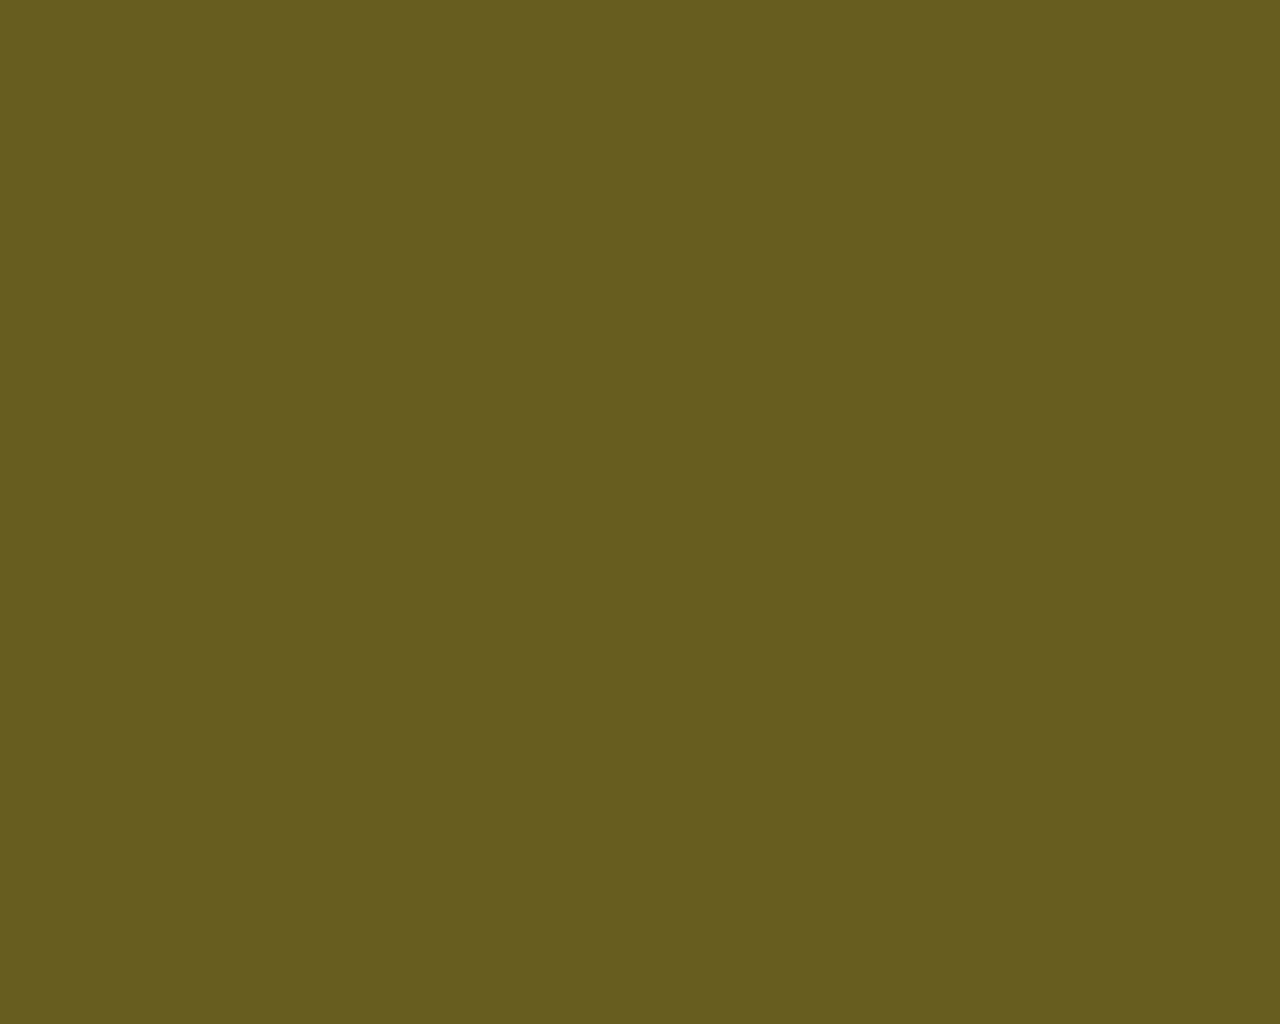 1280x1024 Antique Bronze Solid Color Background